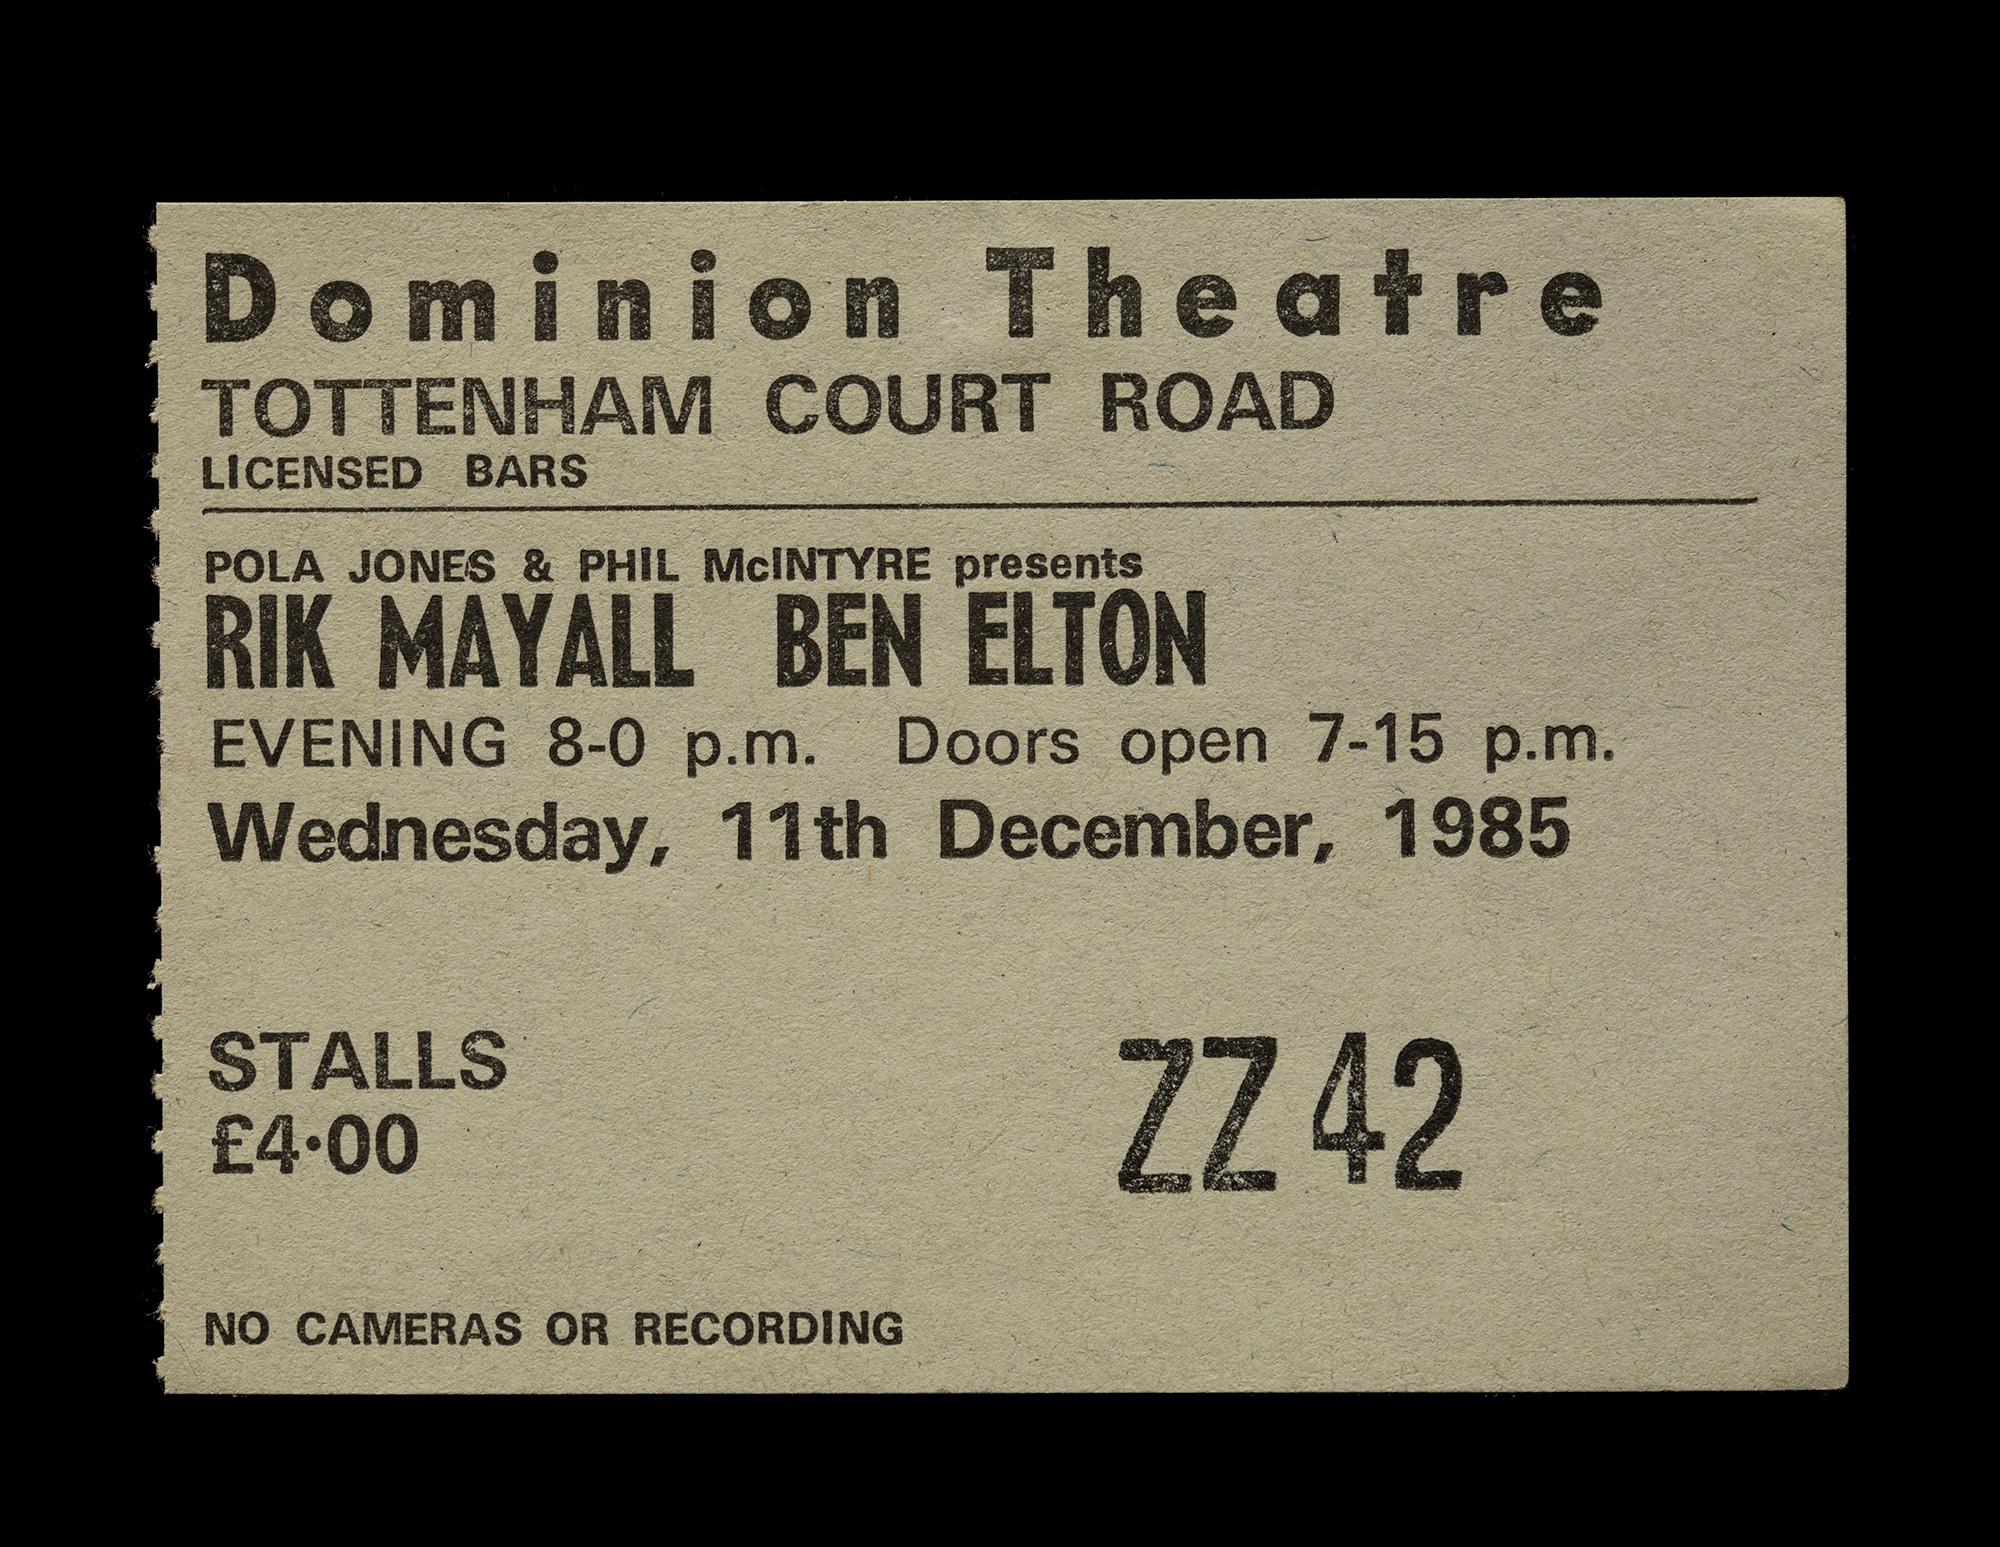 rik-mayall-1985-london-2-2k